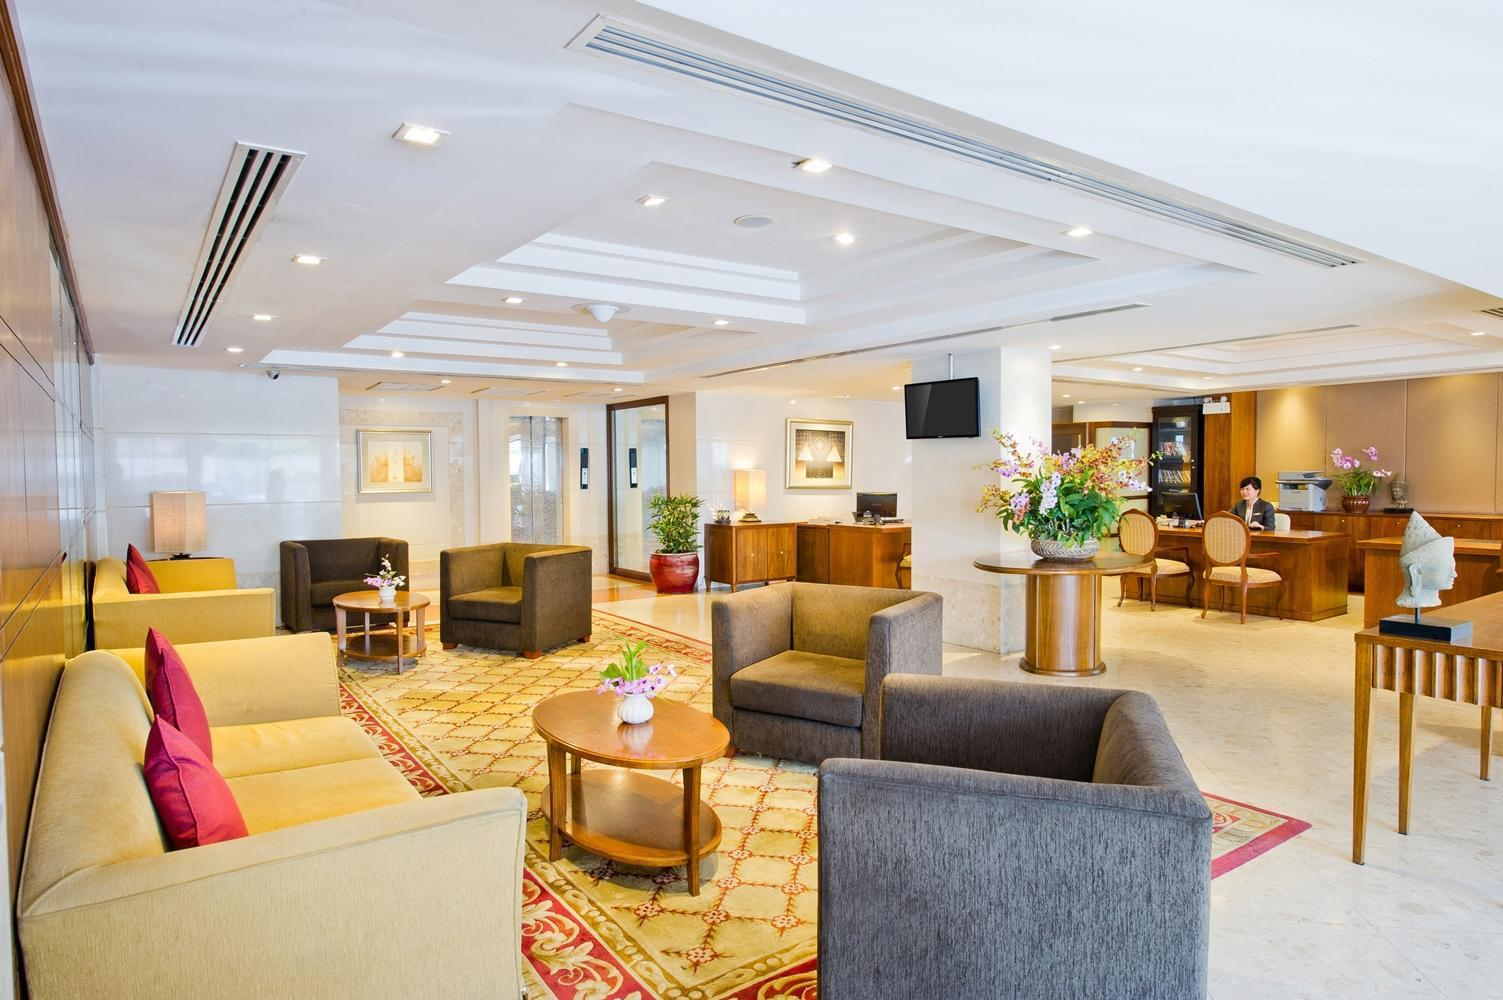 Royal President Hotel โรงแรมรอยัล เพรสซิเดนท์